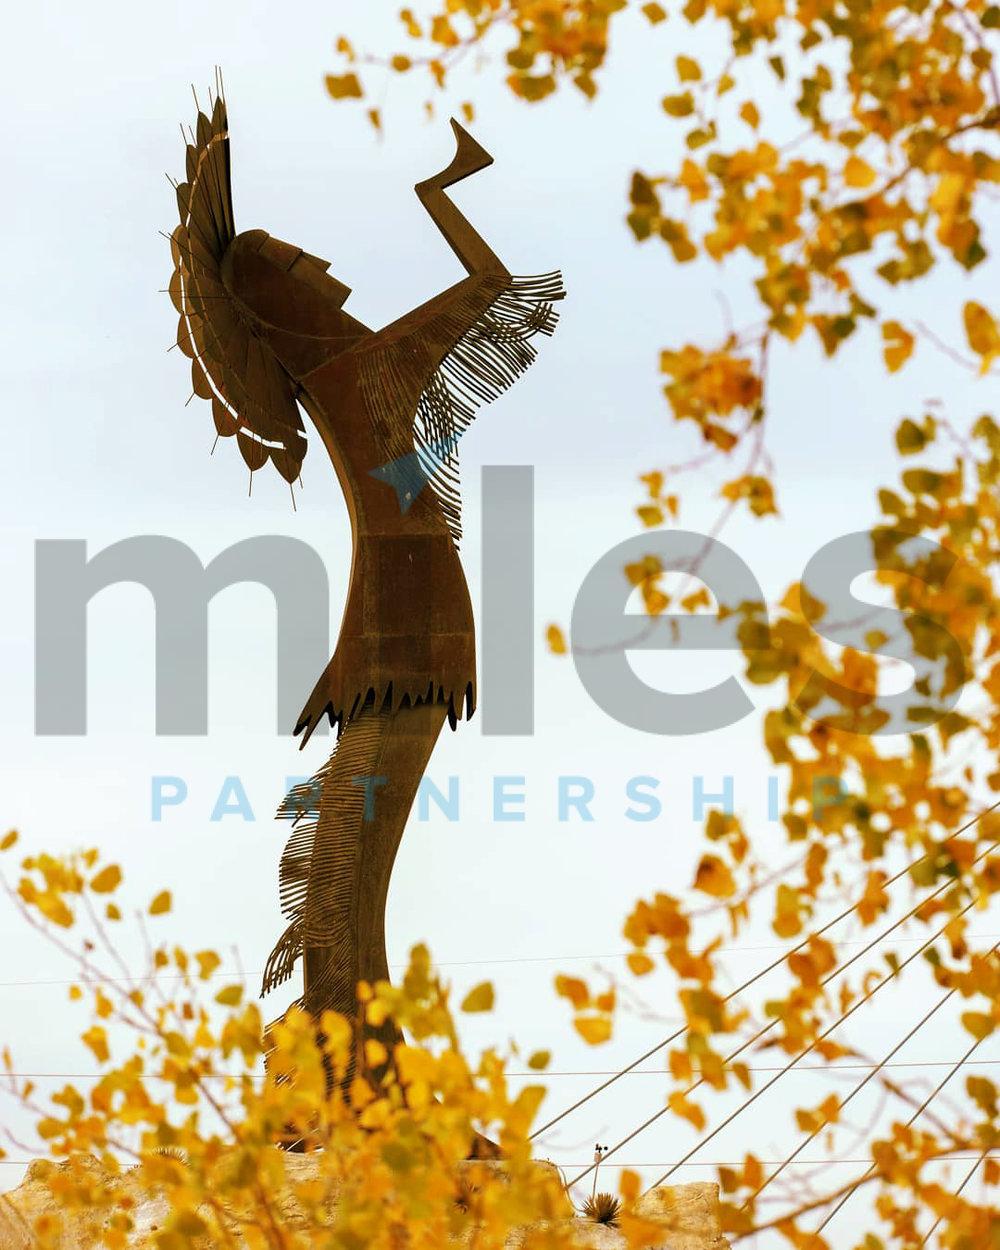 Wasim Muklashy Photography_-Wasim Muklashy Photography_Superswell VR_Miles Partnership_Wichita Kansas_123.jpg